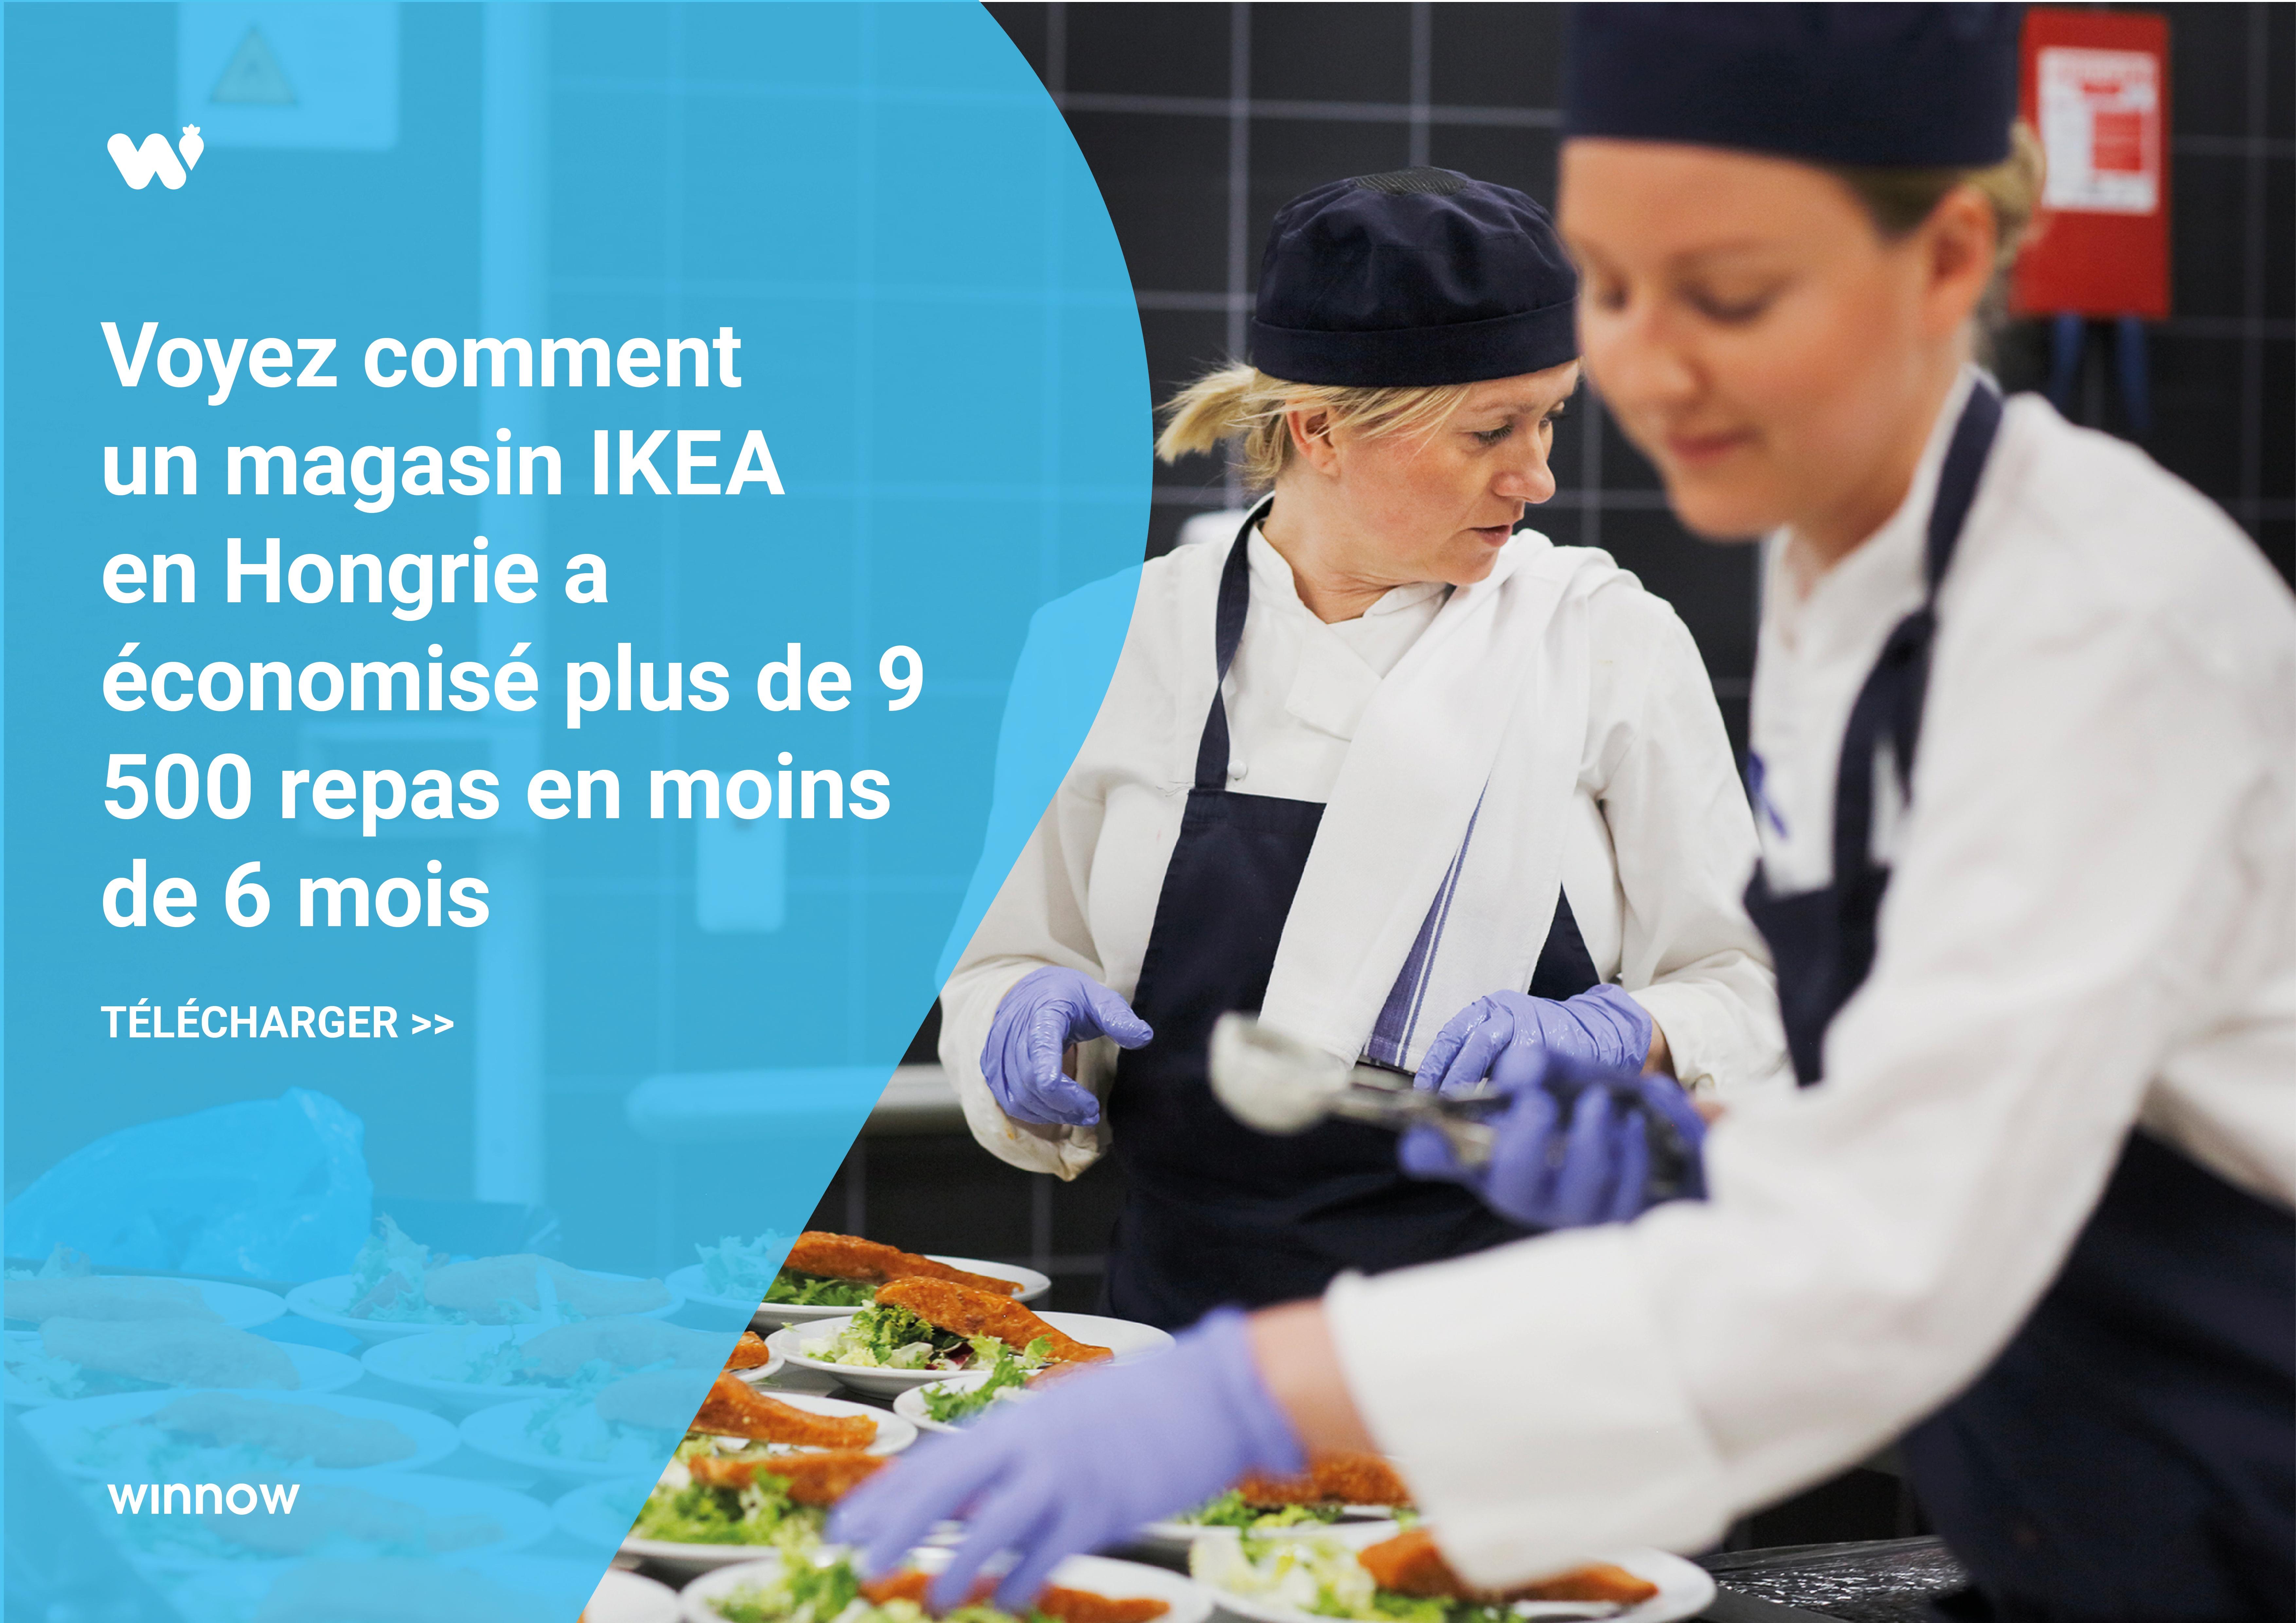 IKEA Budapest